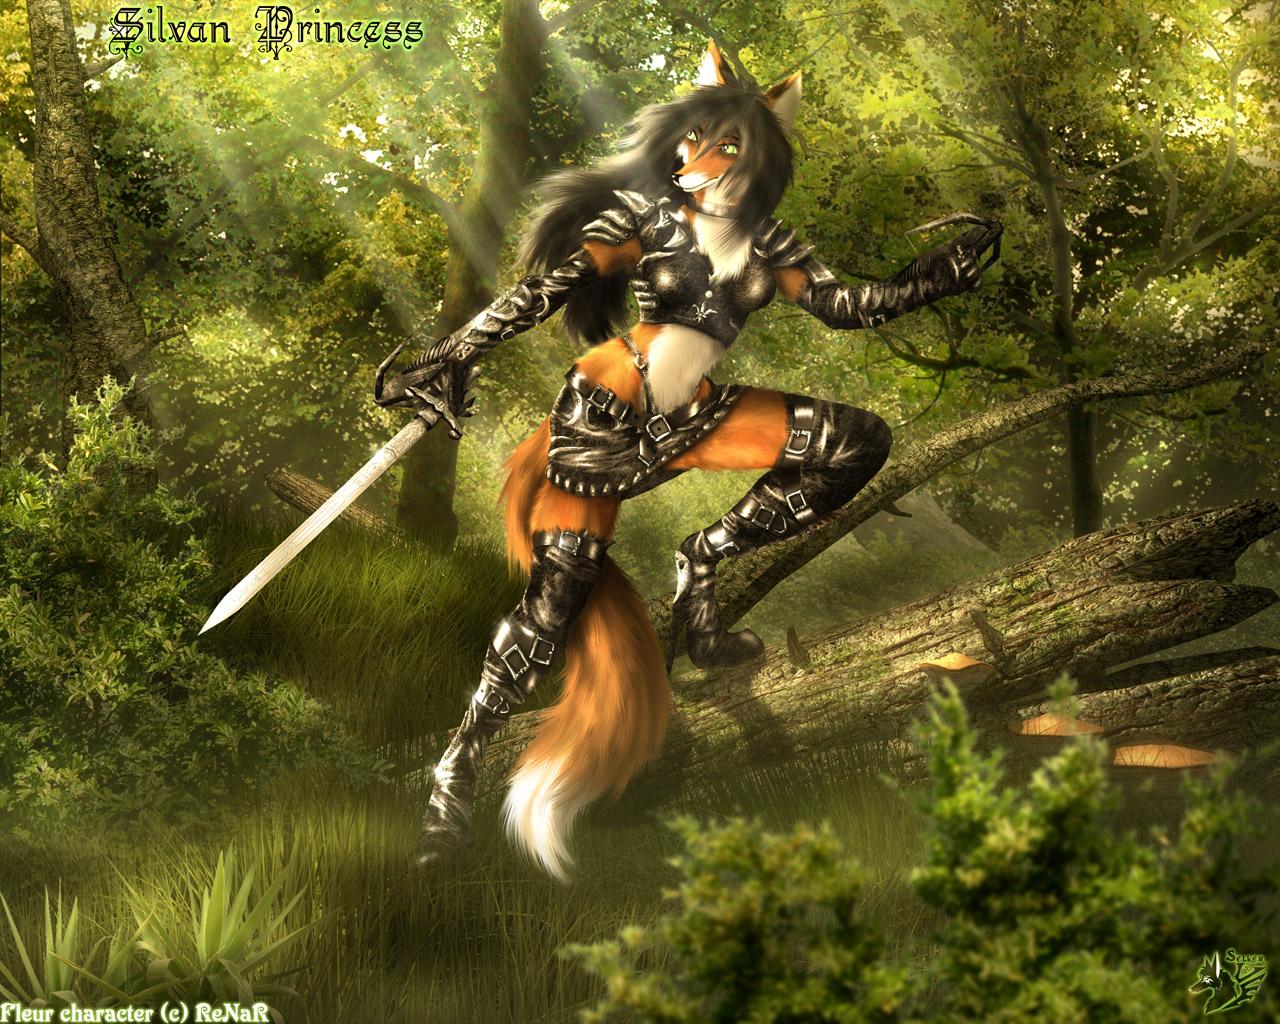 Фурри воины волки лисы картинки 16 фотография